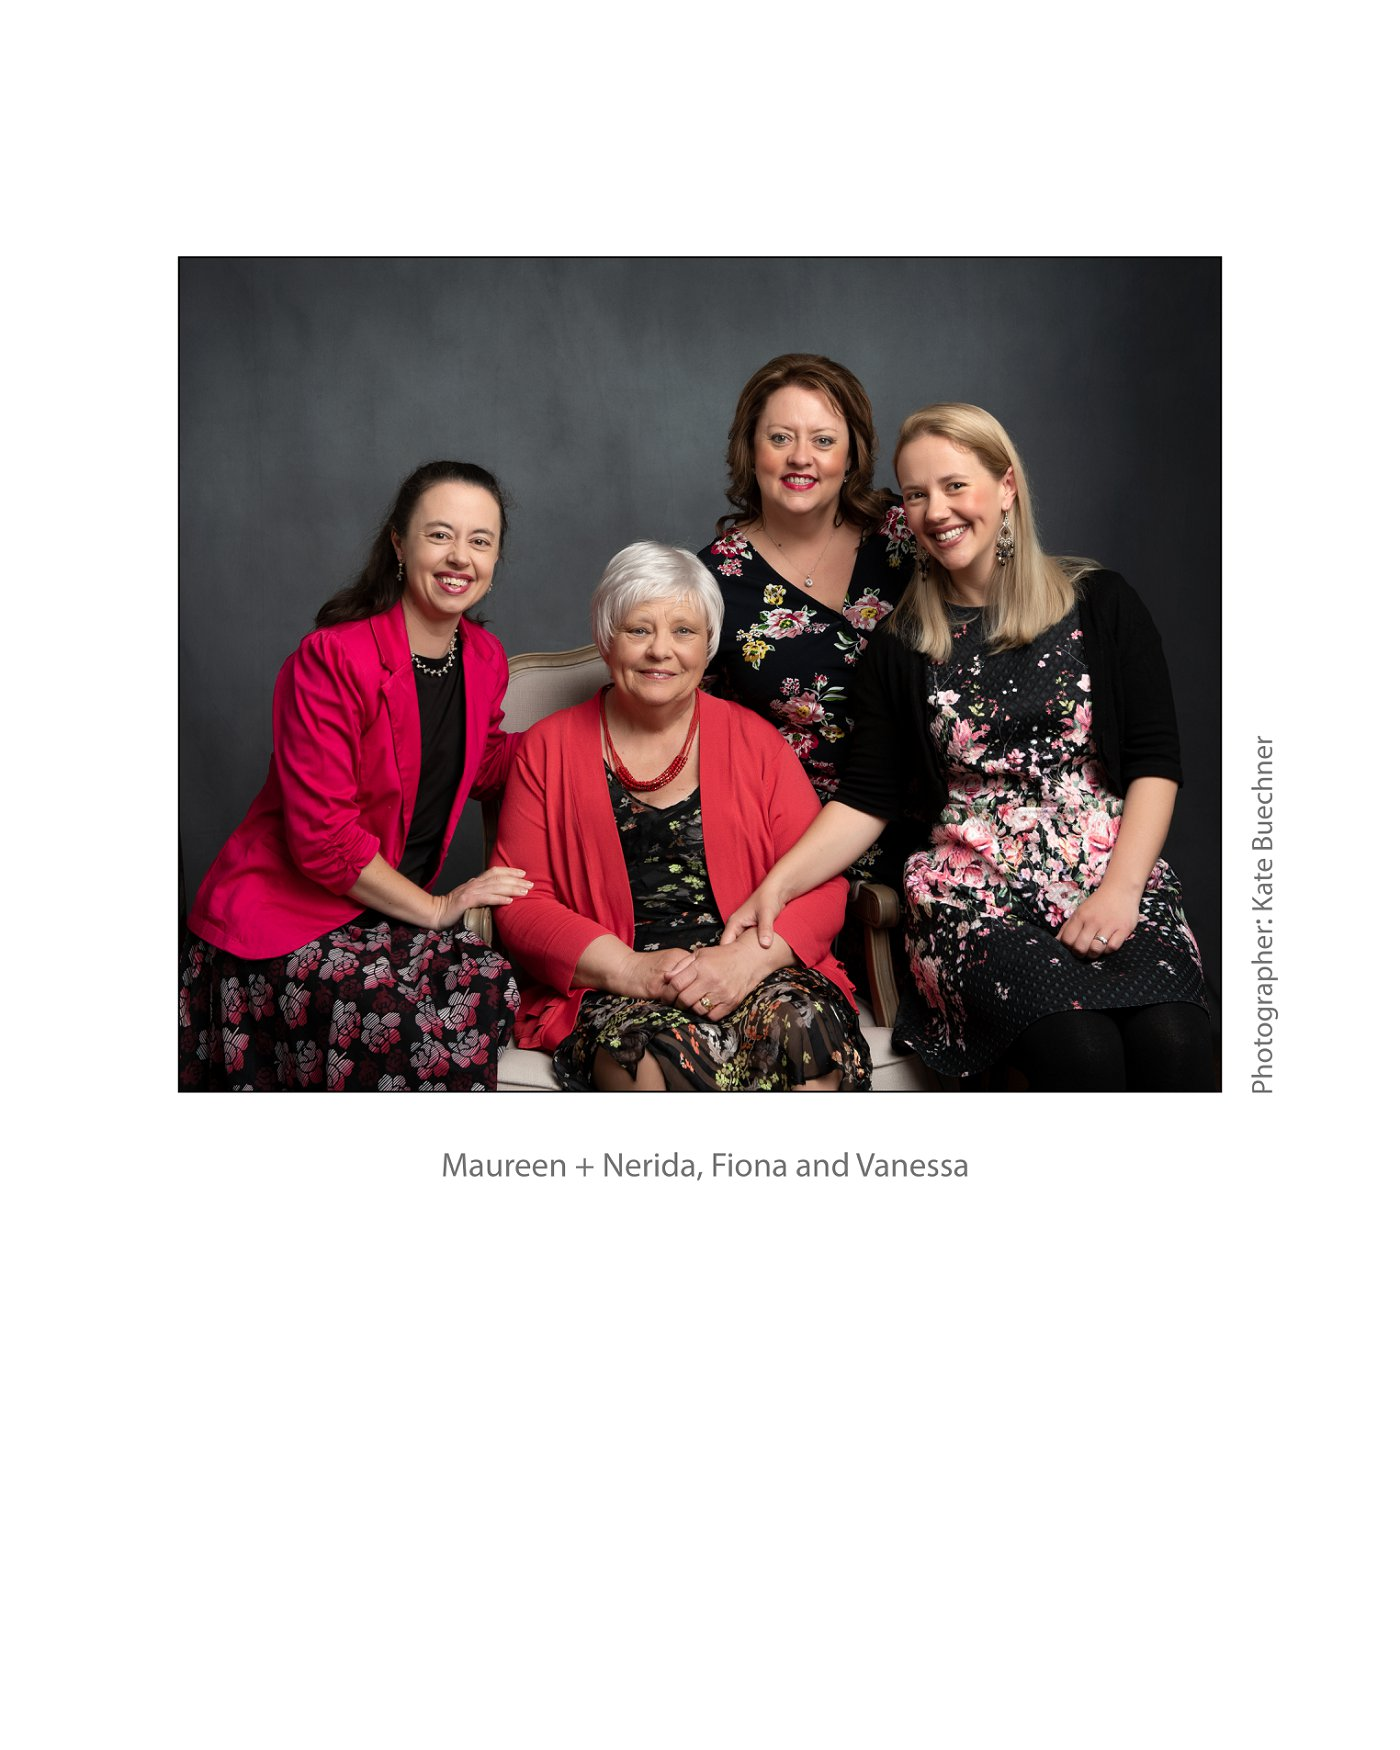 family photographer sydney (23).jpg